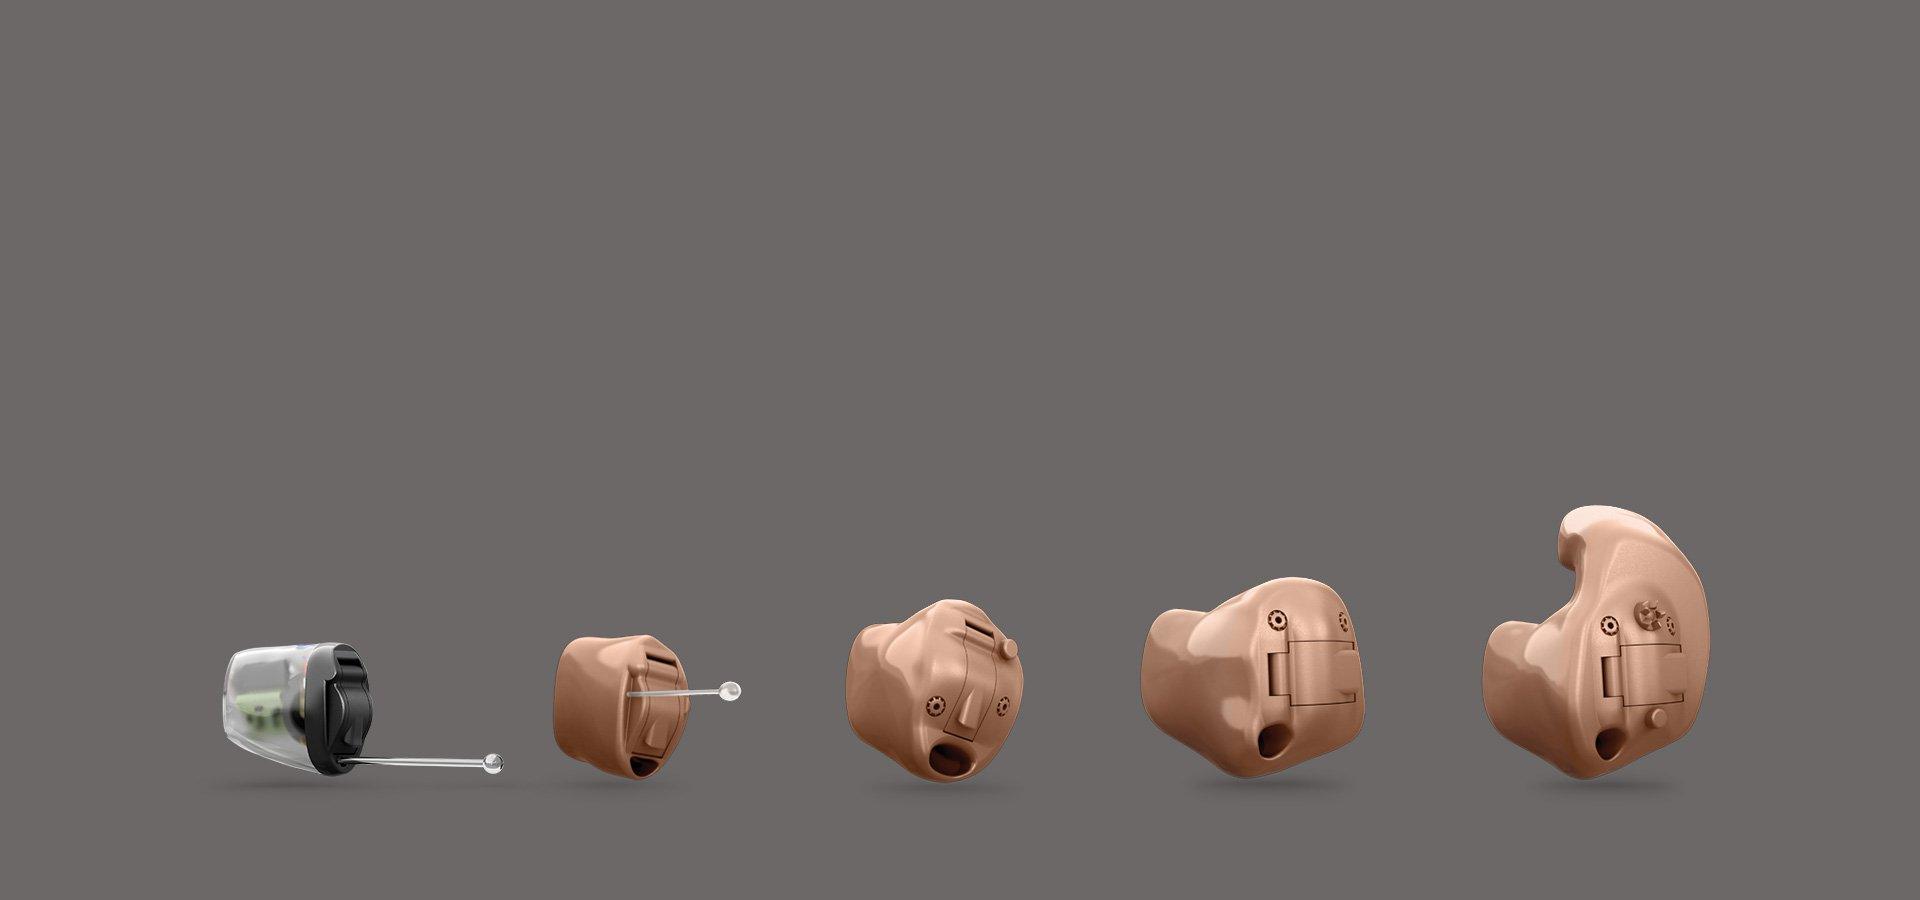 bannerspot-solutions-pl-custom-1920x900